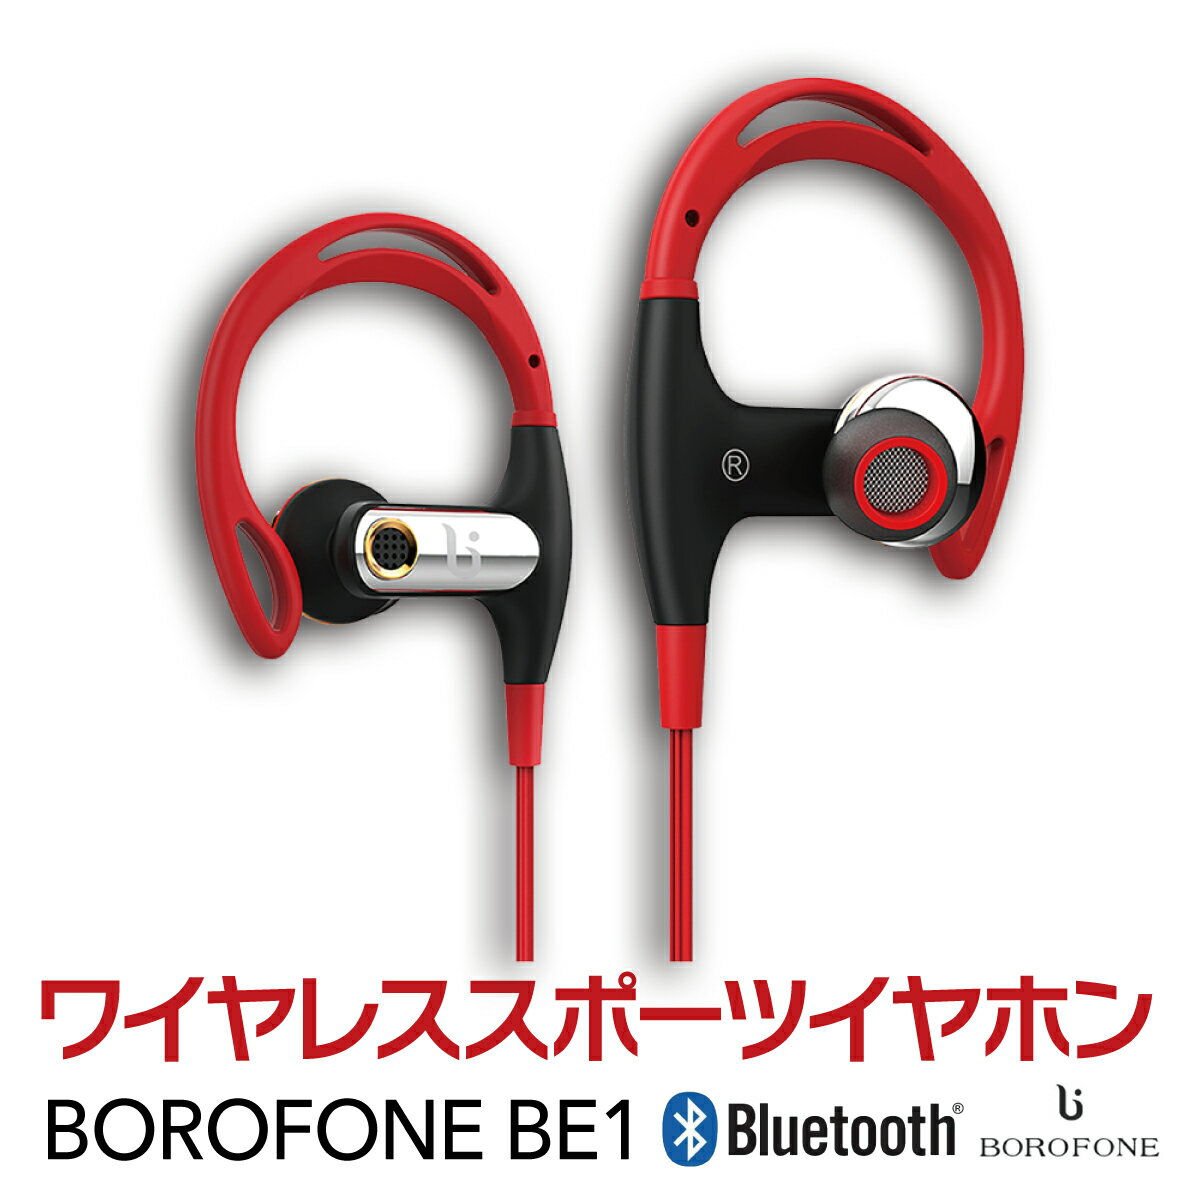 Bluetooth ワイヤレスイヤホン スポーツイヤホン ヘッドセット イヤホンマイク ハンズフリーヘッドセットワイヤレス イヤホン ランニング Bluetooth 4.0 送料無料 ボロフォン BOROFONE borofone-be1